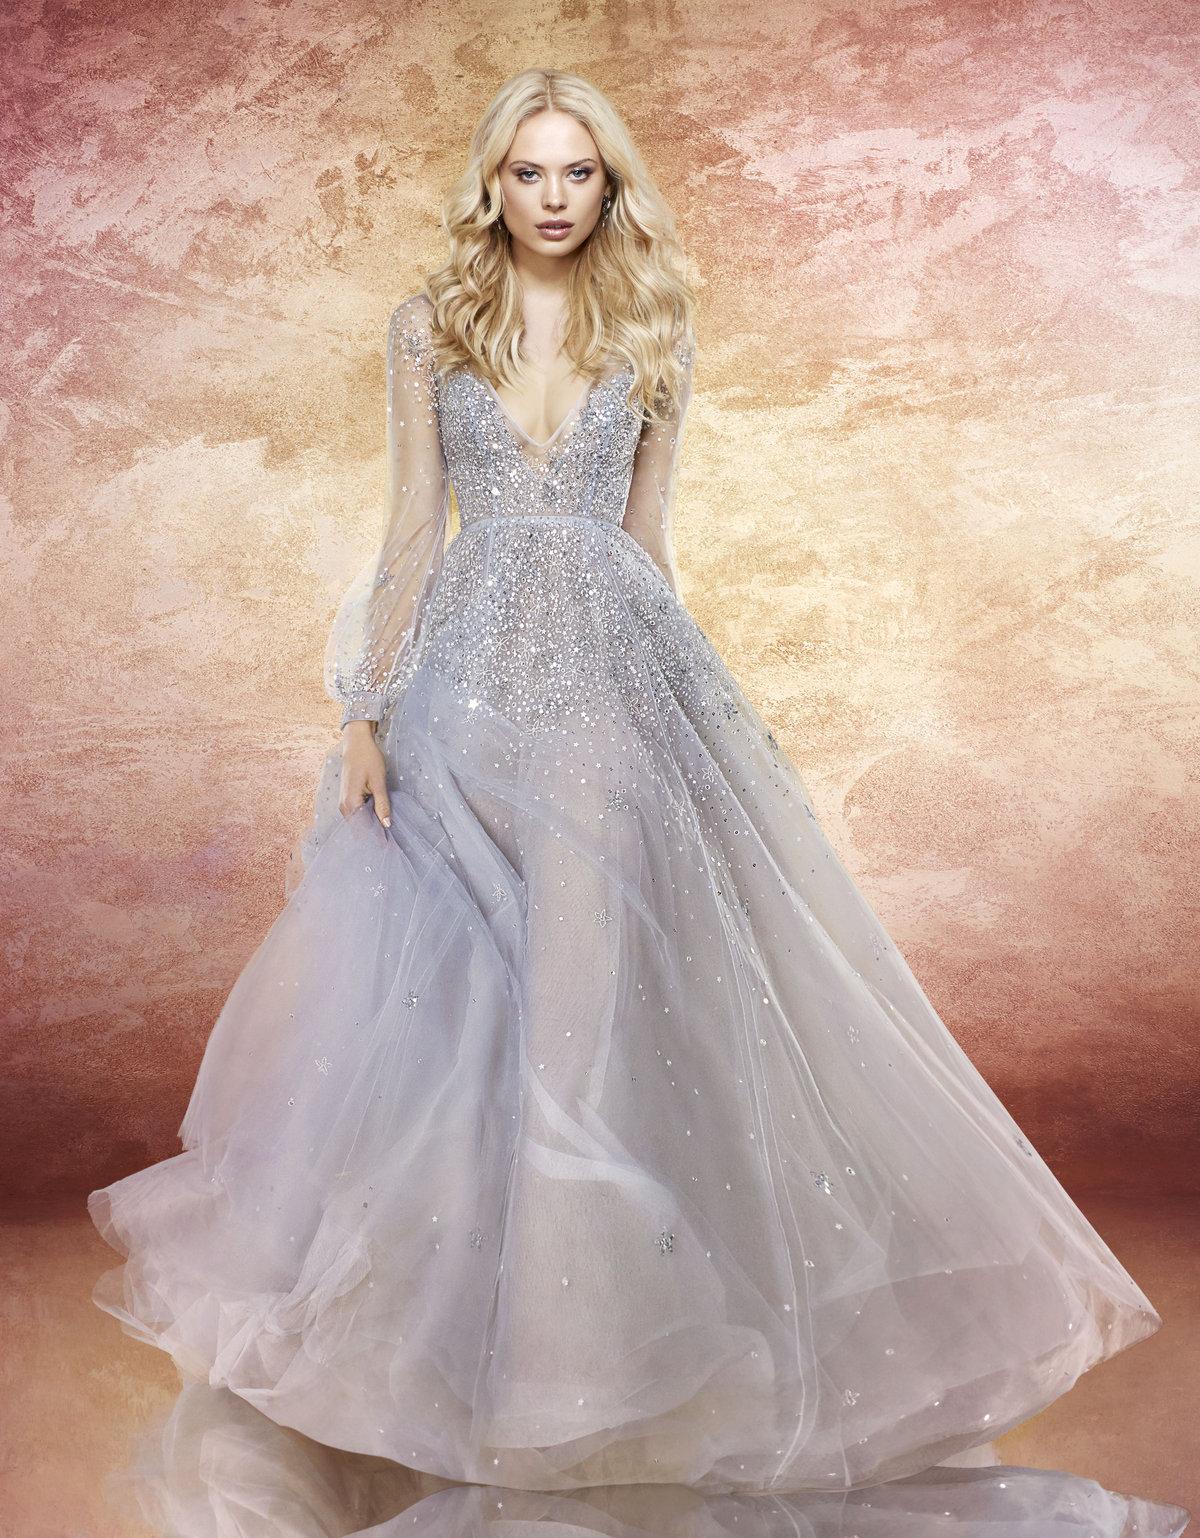 haley paige wedding dresses photo - 1